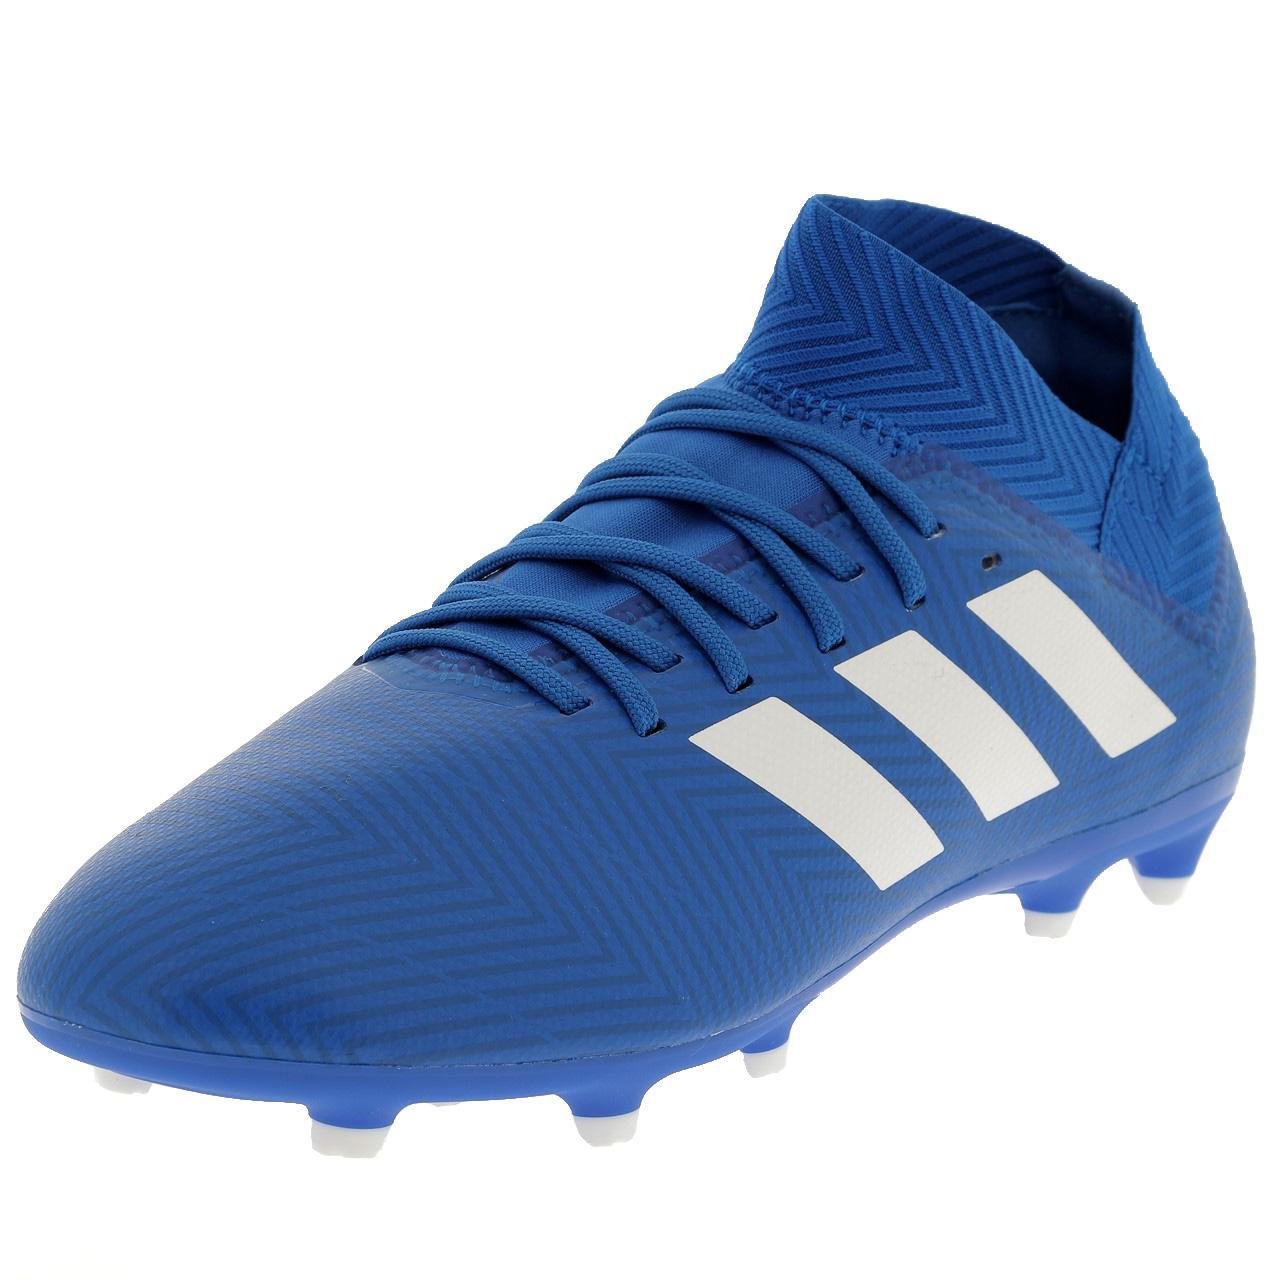 Dettagli su Scarpe Calcio Lamelle Adidas Nemeziz 18.3 Fg Jr Blu 47850 Nuovo